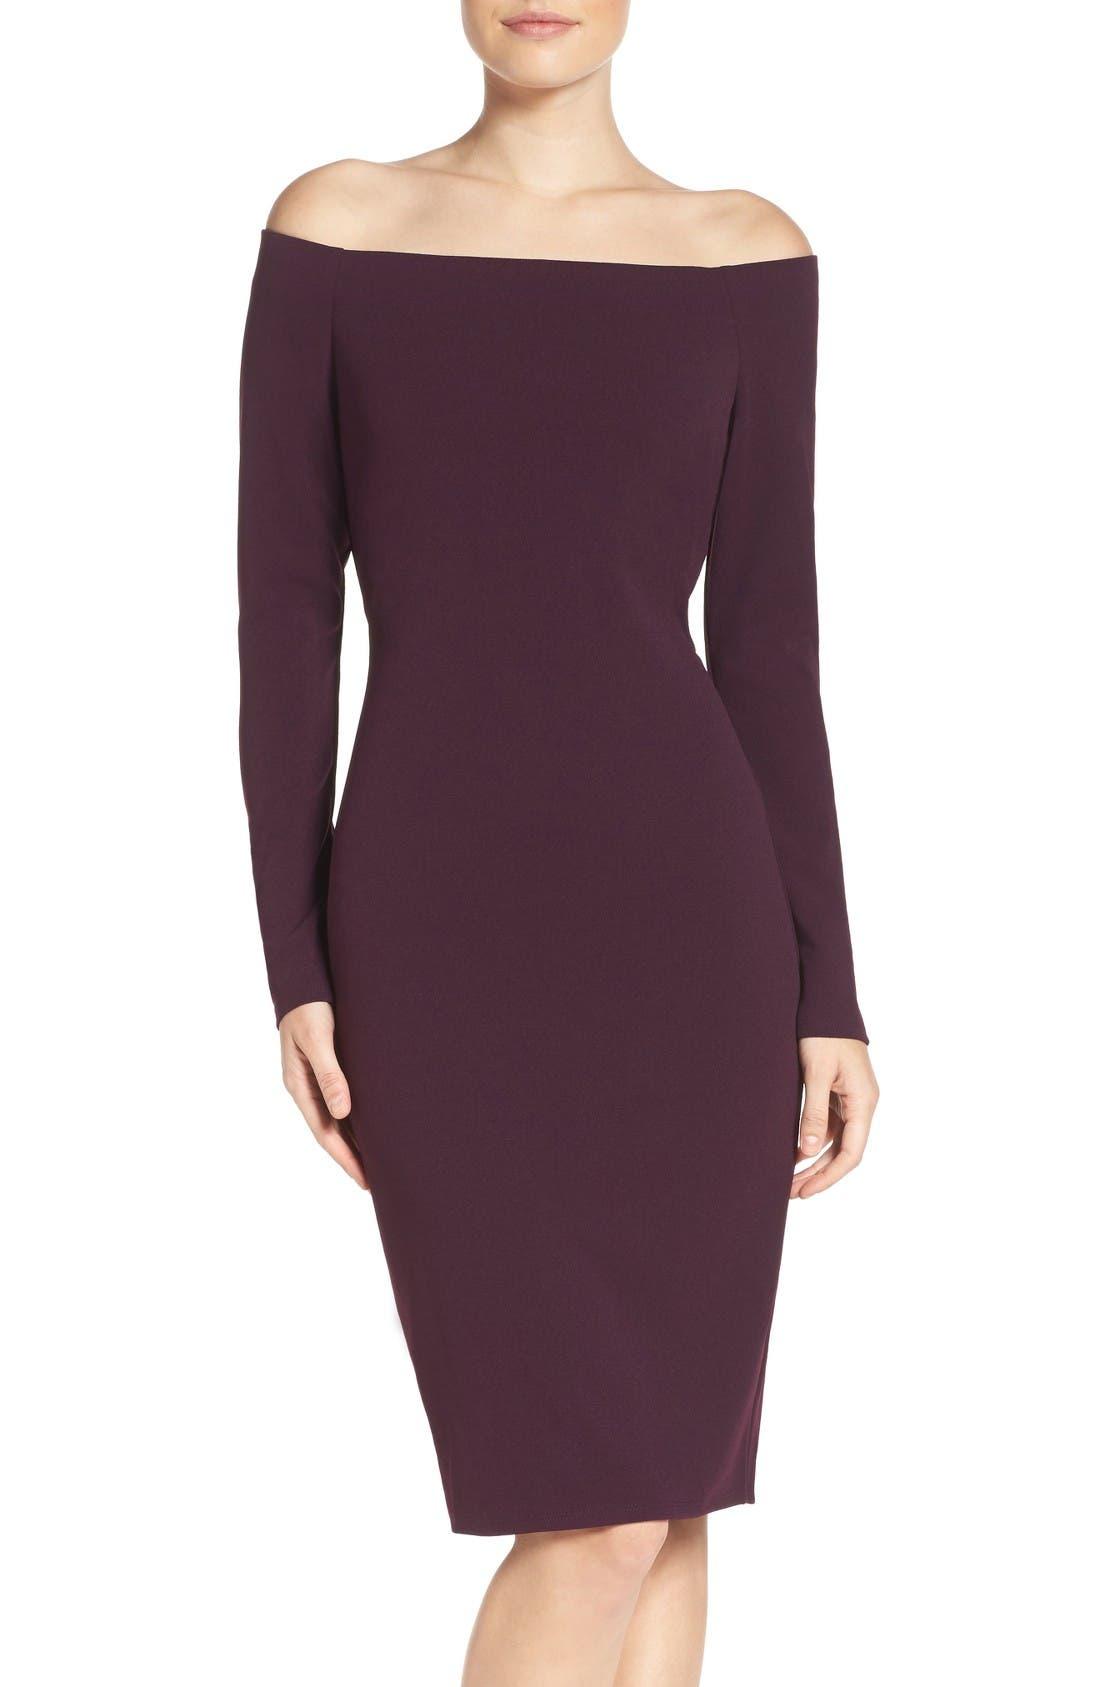 Alternate Image 1 Selected - Eliza J Off the Shoulder Scuba Sheath Dress (Regular & Petite)